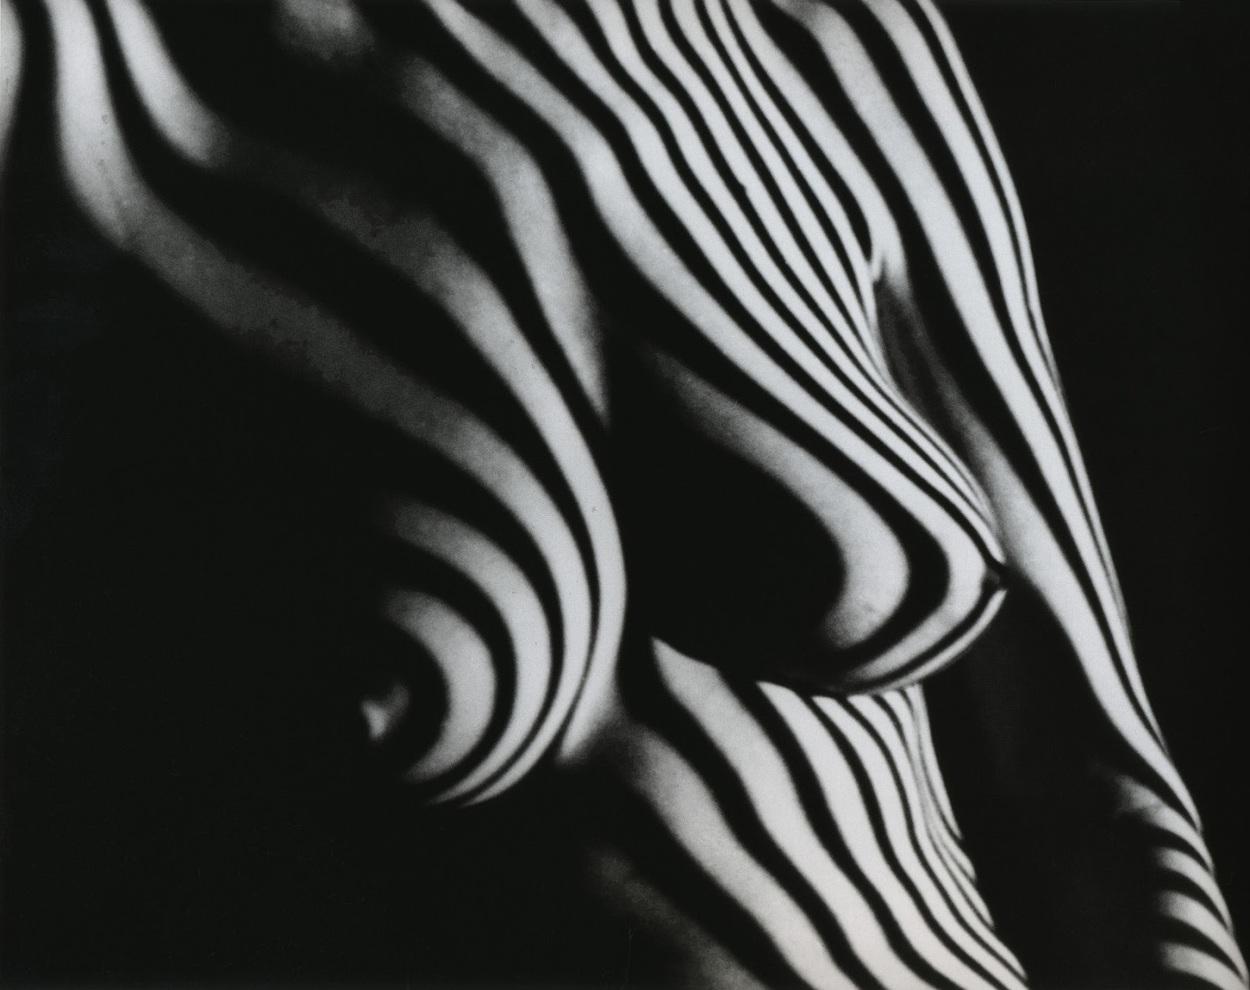 Fernand_Fonssagrives_Suzette_1954-1958_1250